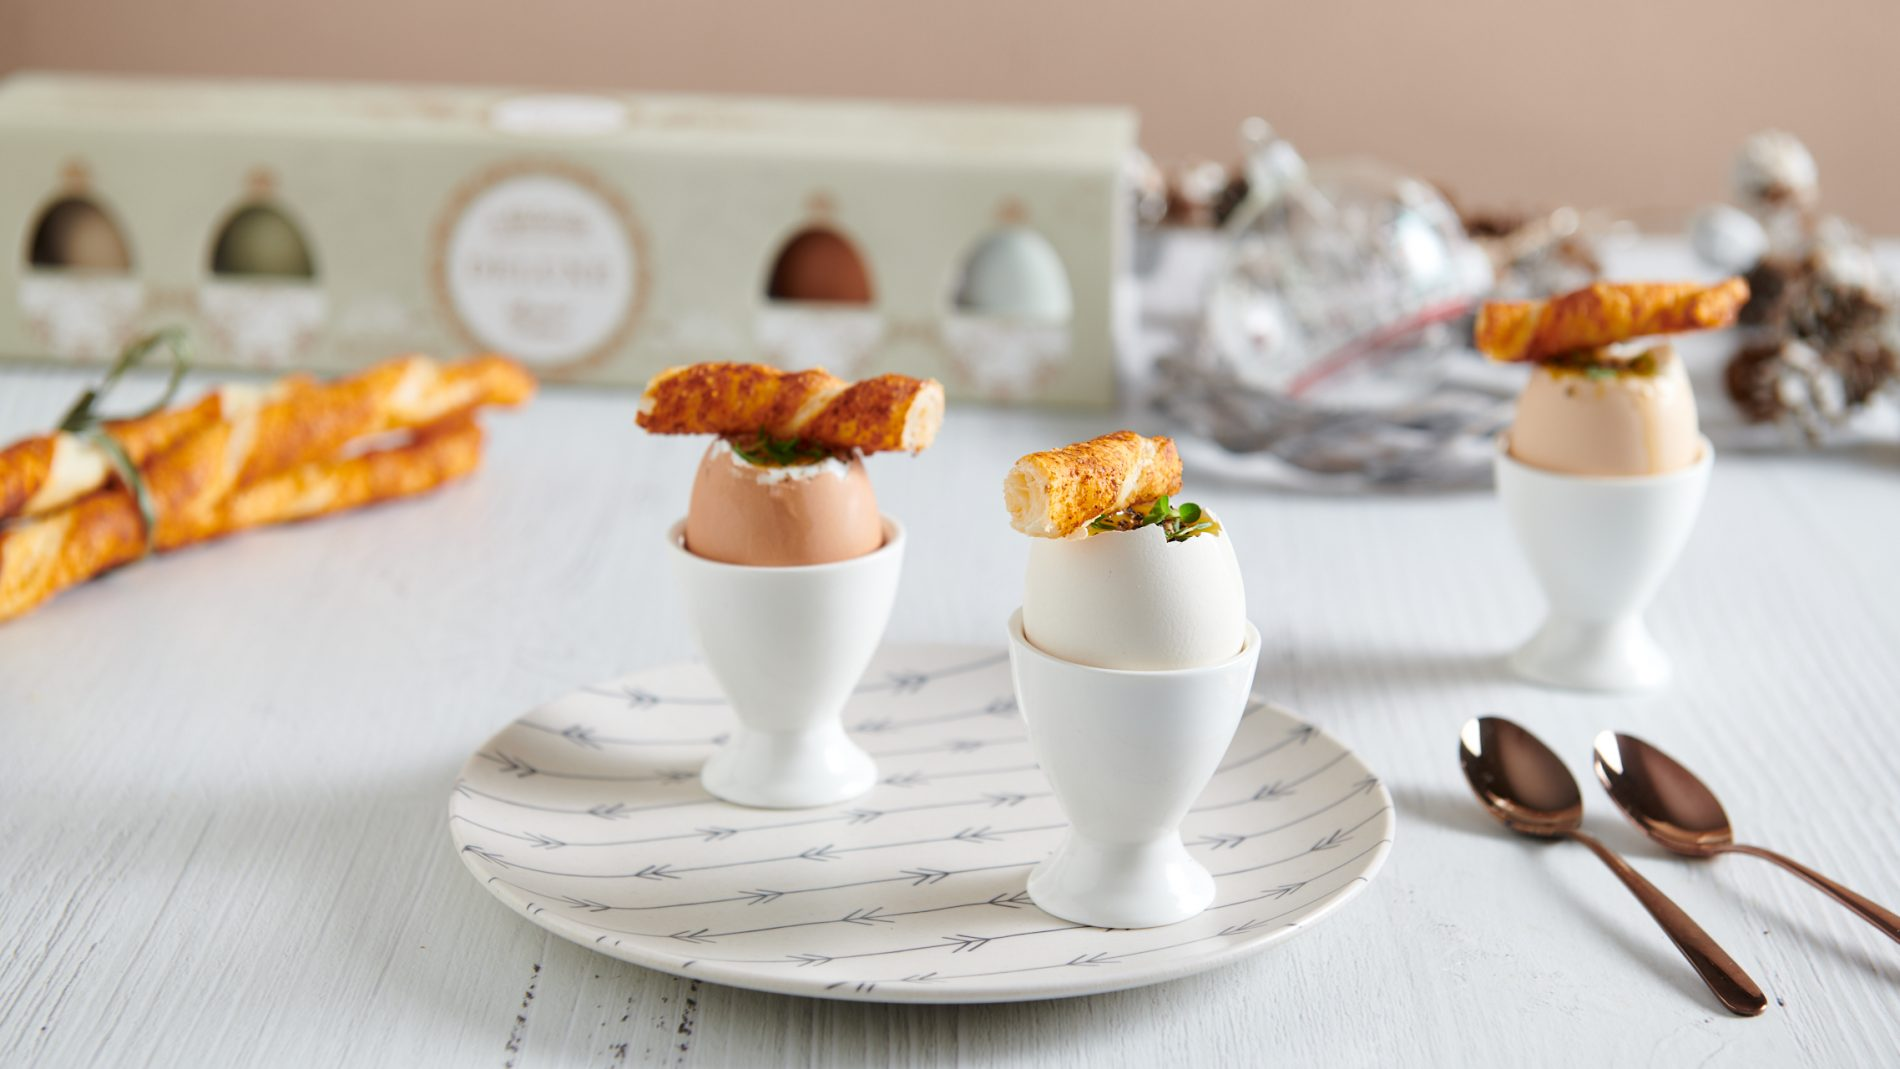 dieta smagliature: uova